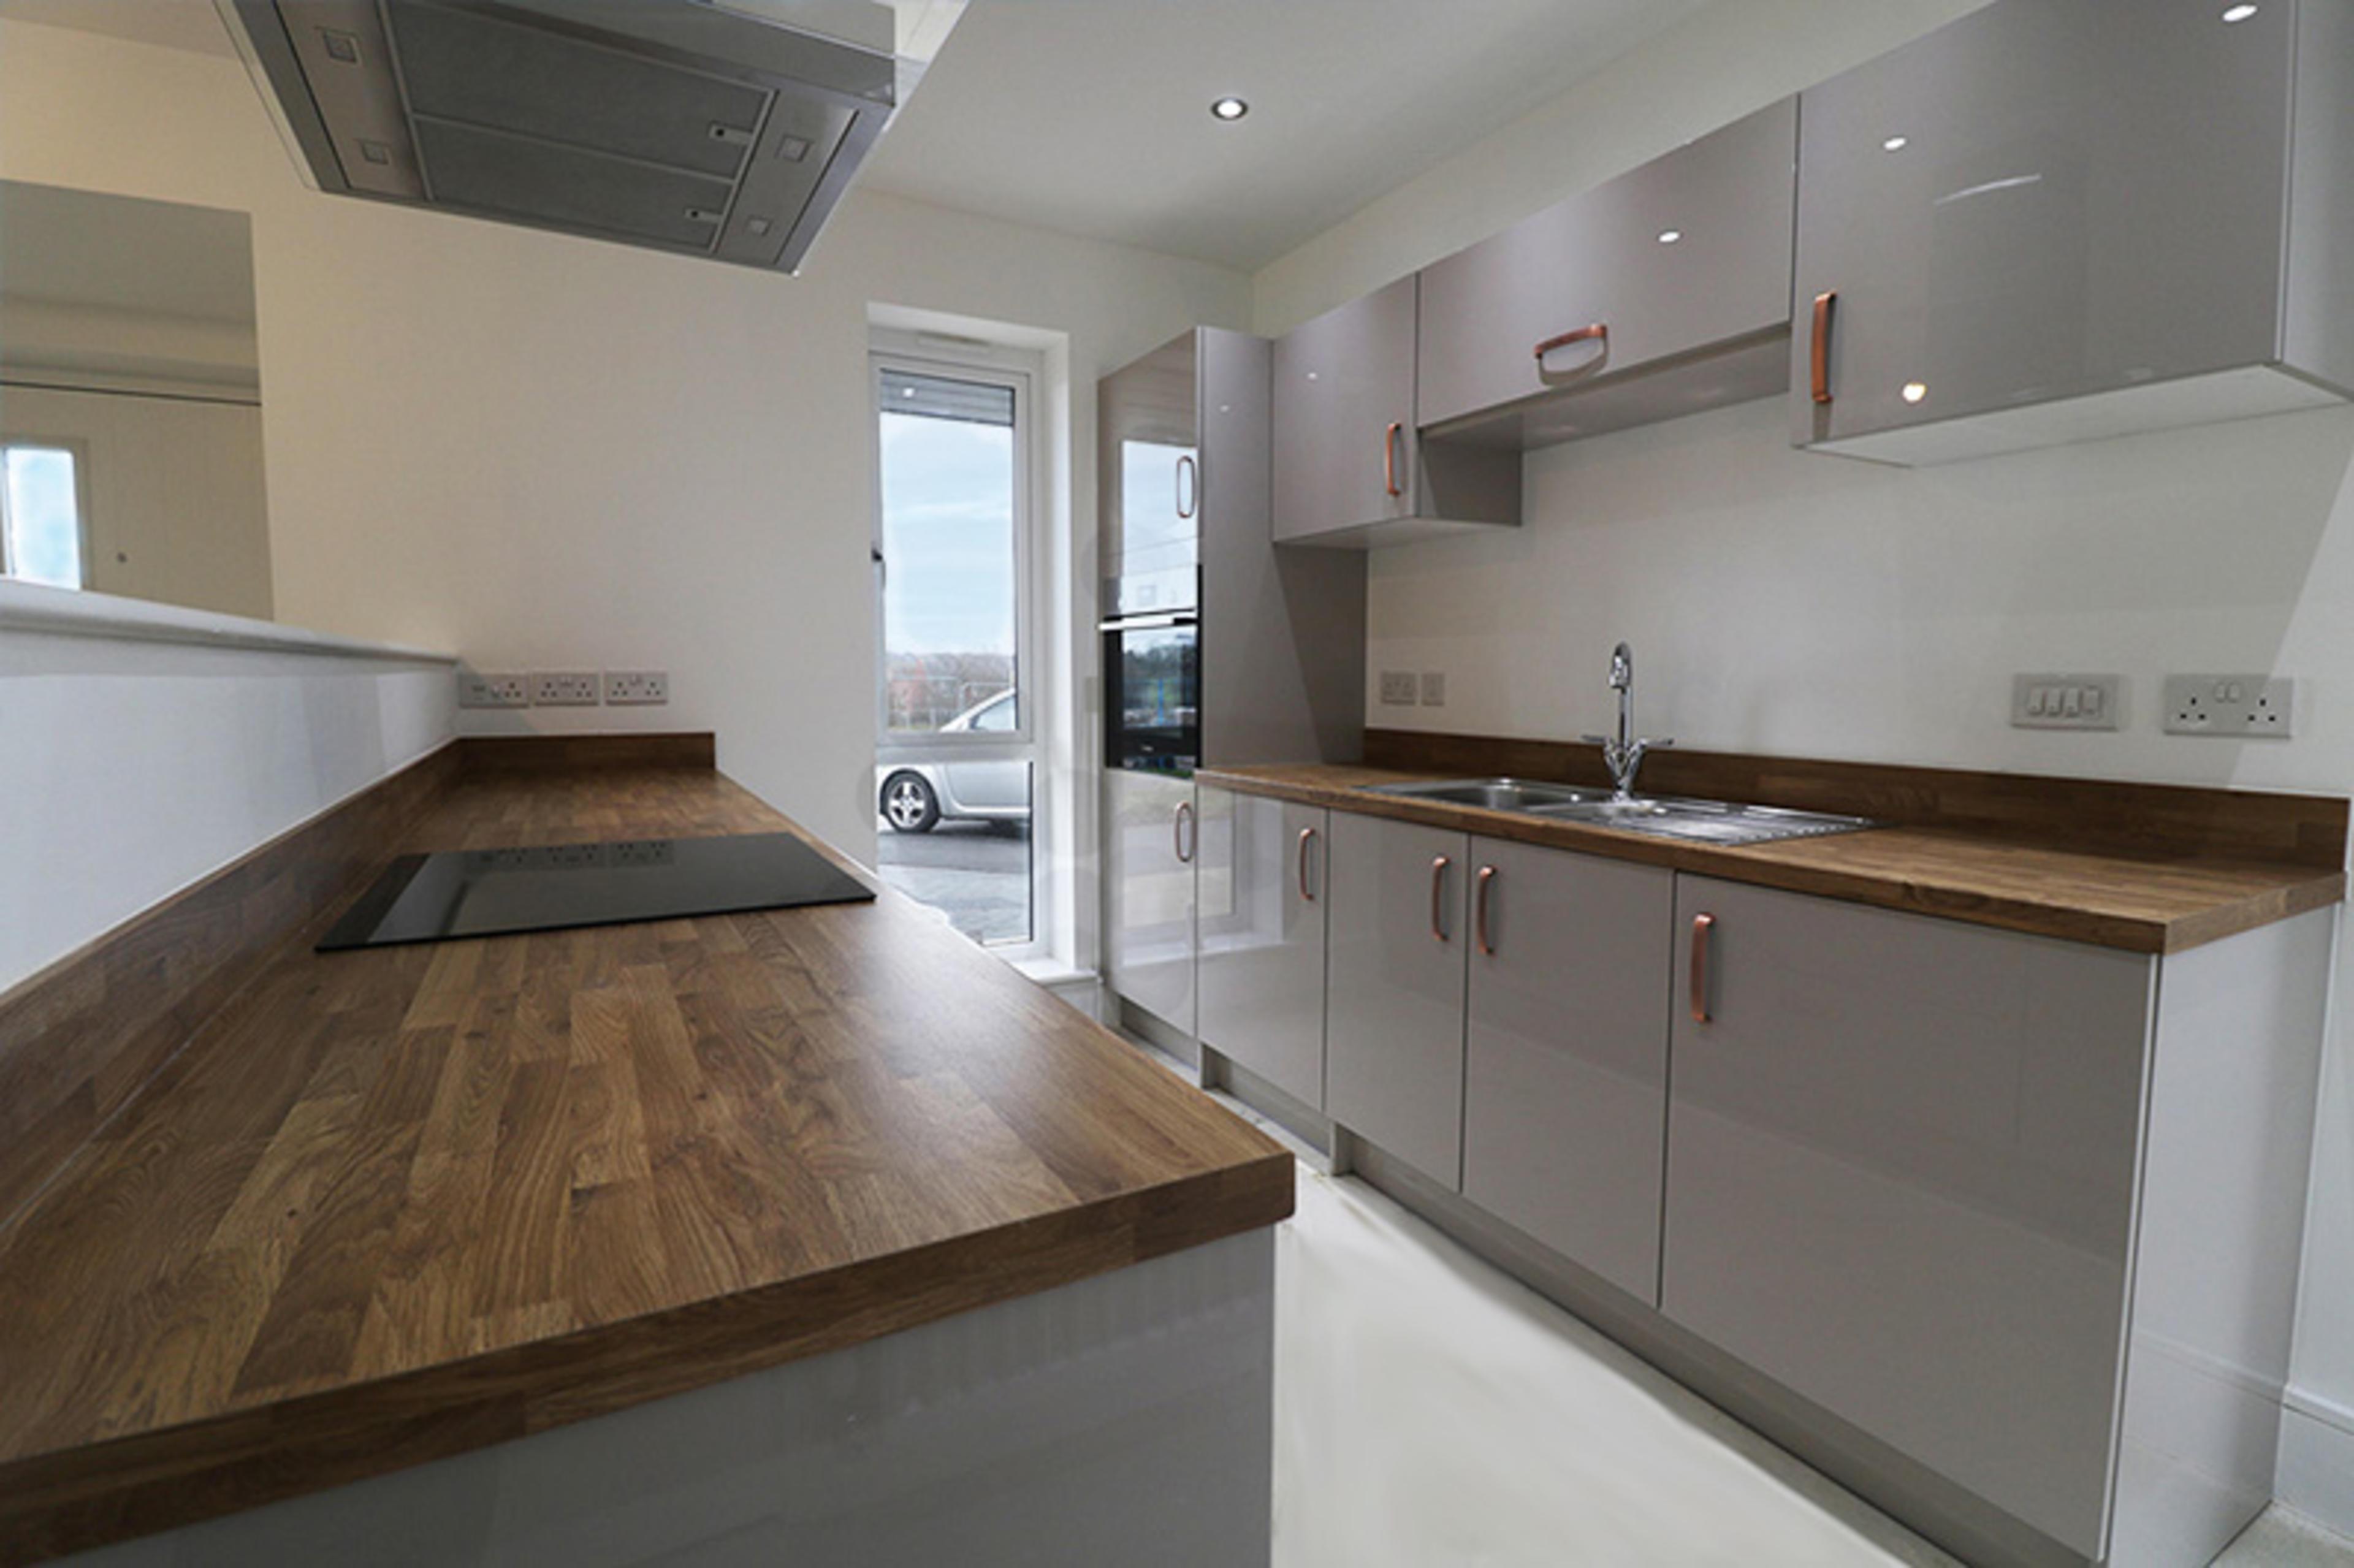 watling-grange-harrogate-coverham-3-bed-home-kitchen-1